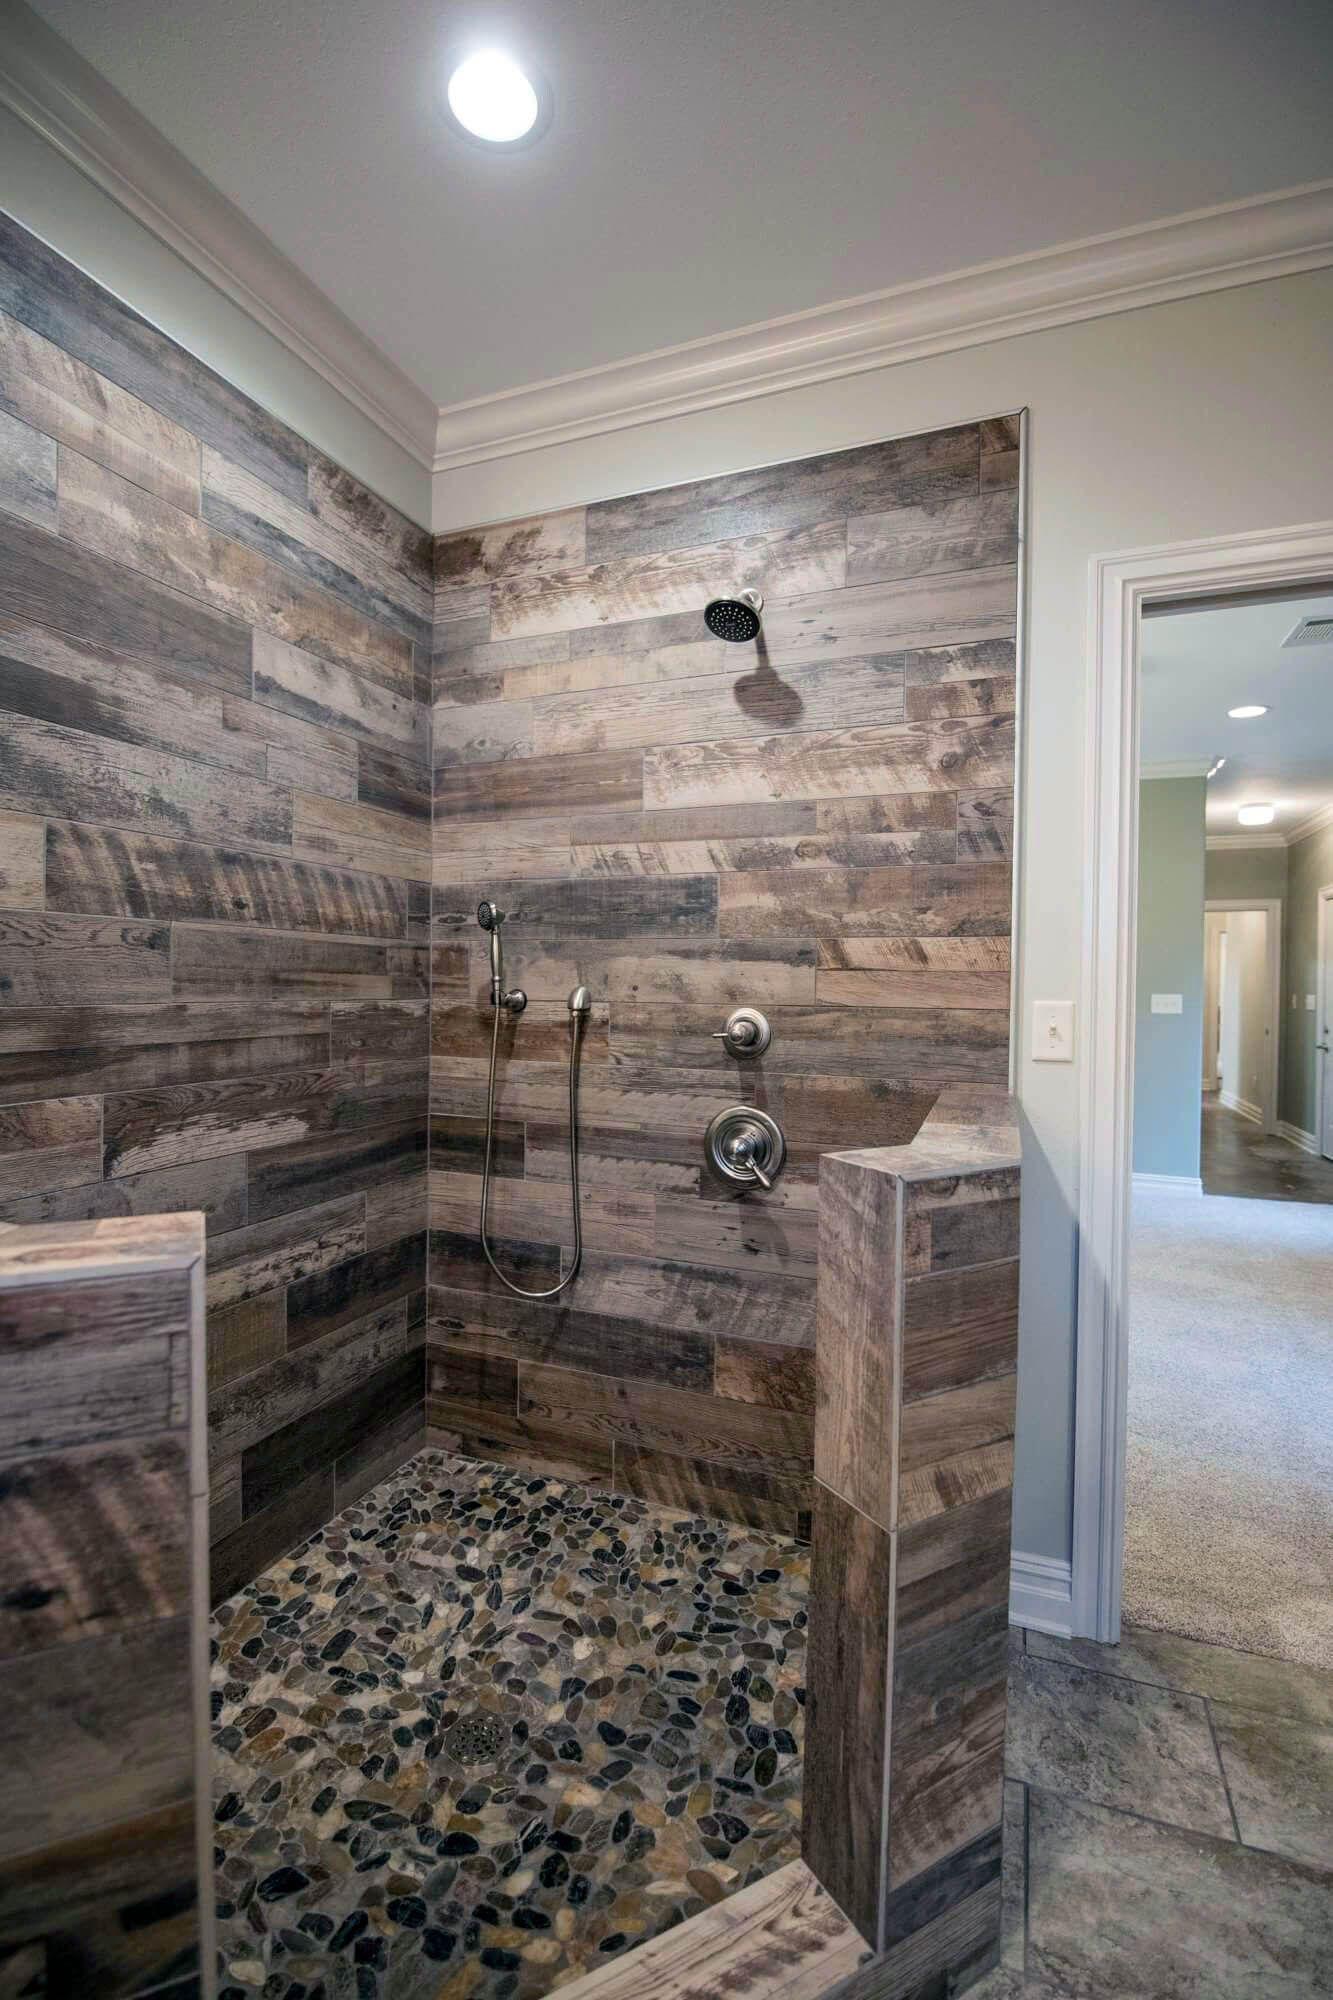 7 unique bathroom tiles ideas show your personality on bathroom renovation ideas id=38708